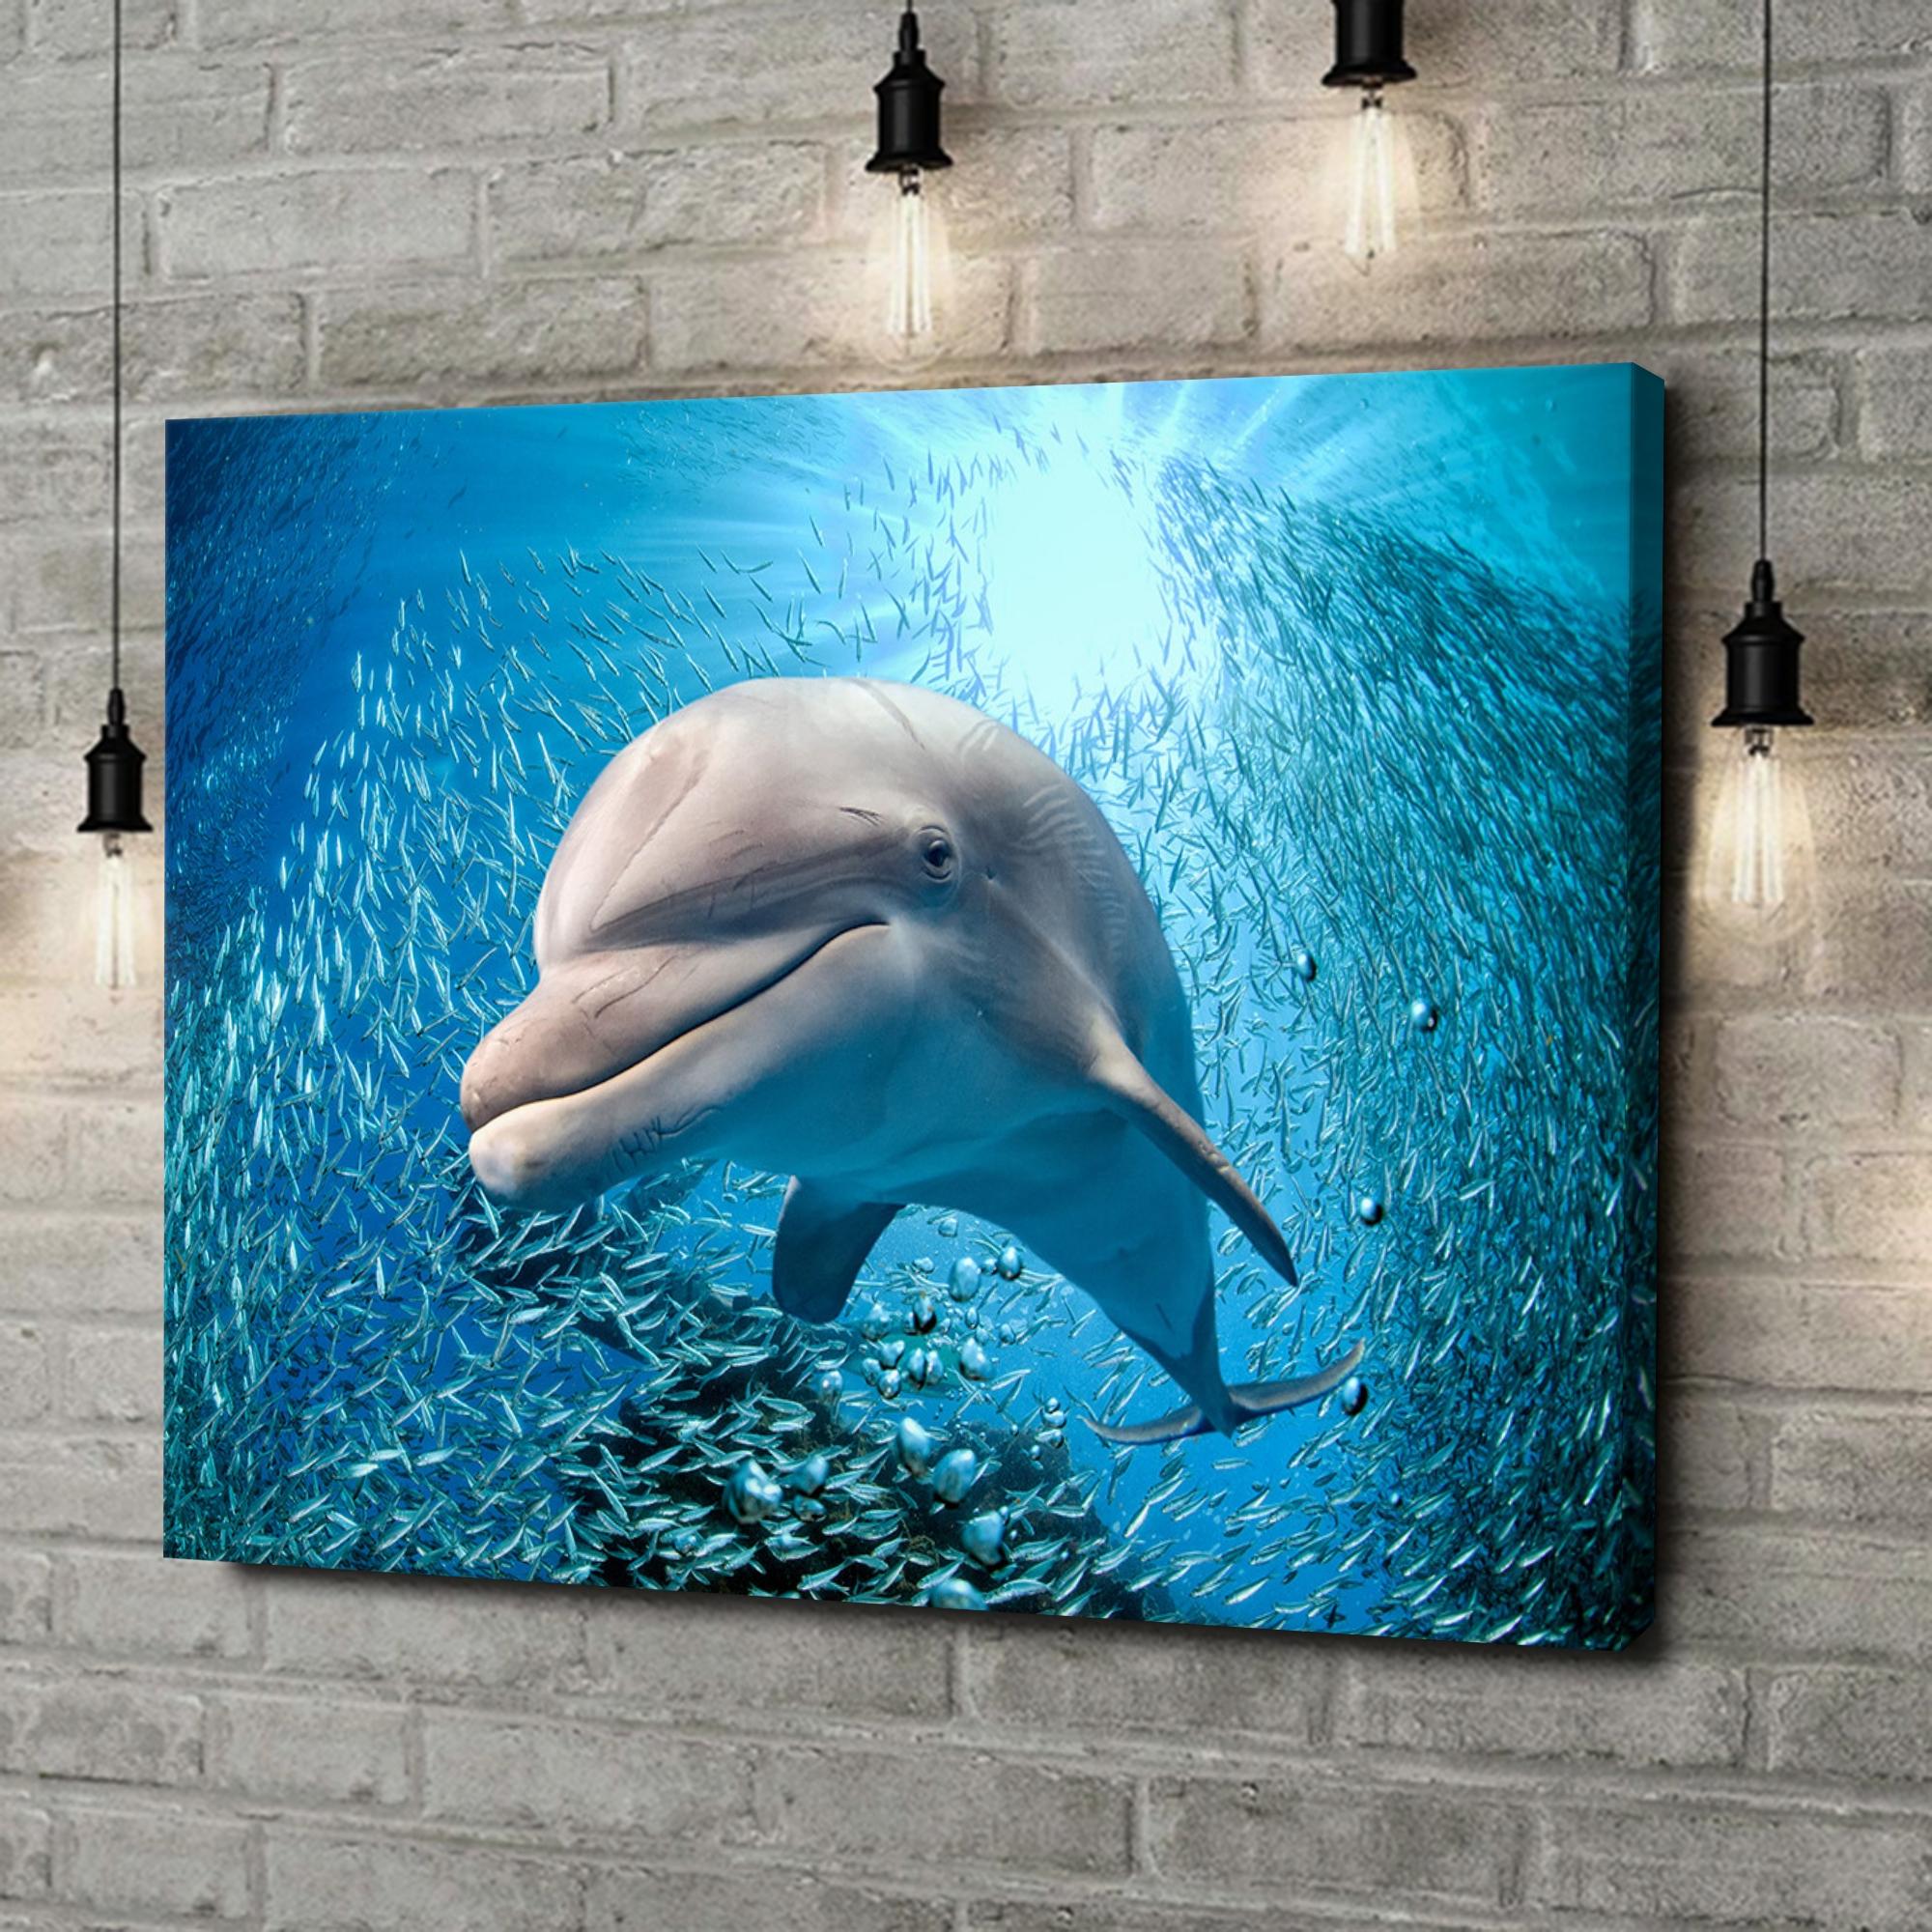 Leinwandbild personalisiert Delfin im Meer